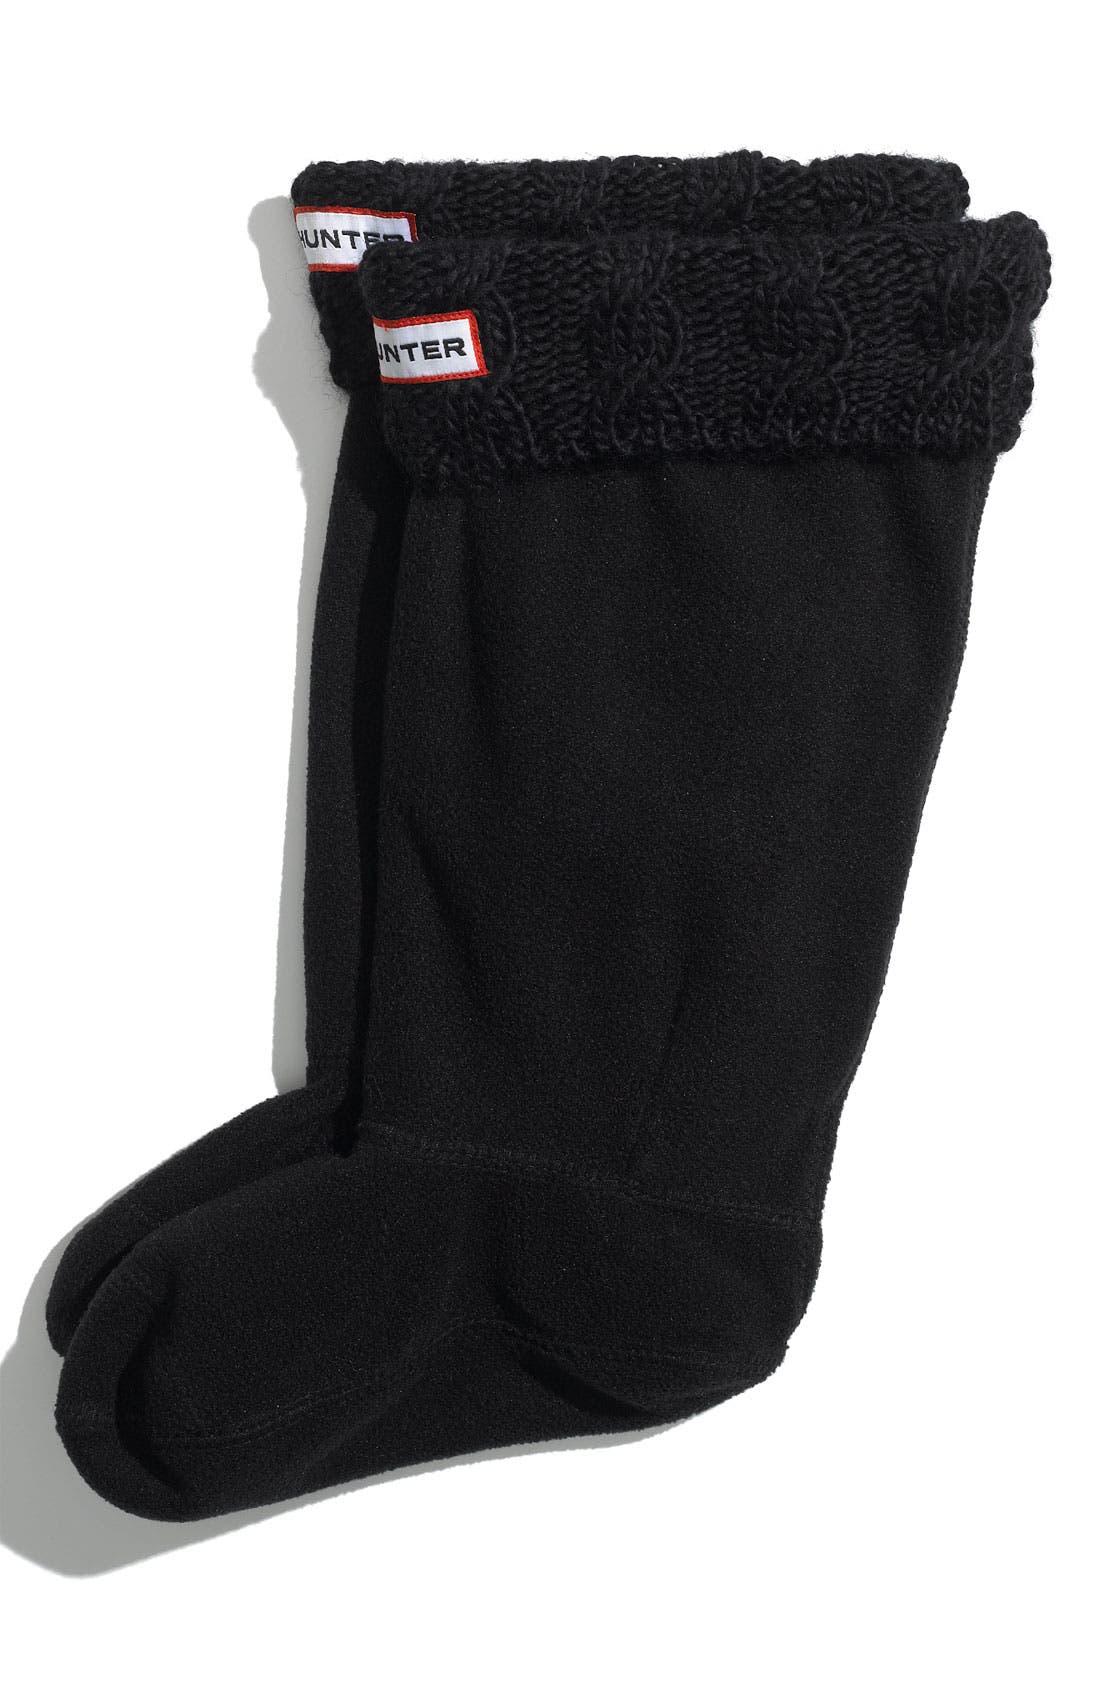 Main Image - Hunter Cabled Cuff Welly Socks (Toddler Girls, Little Girls & Big Girls)